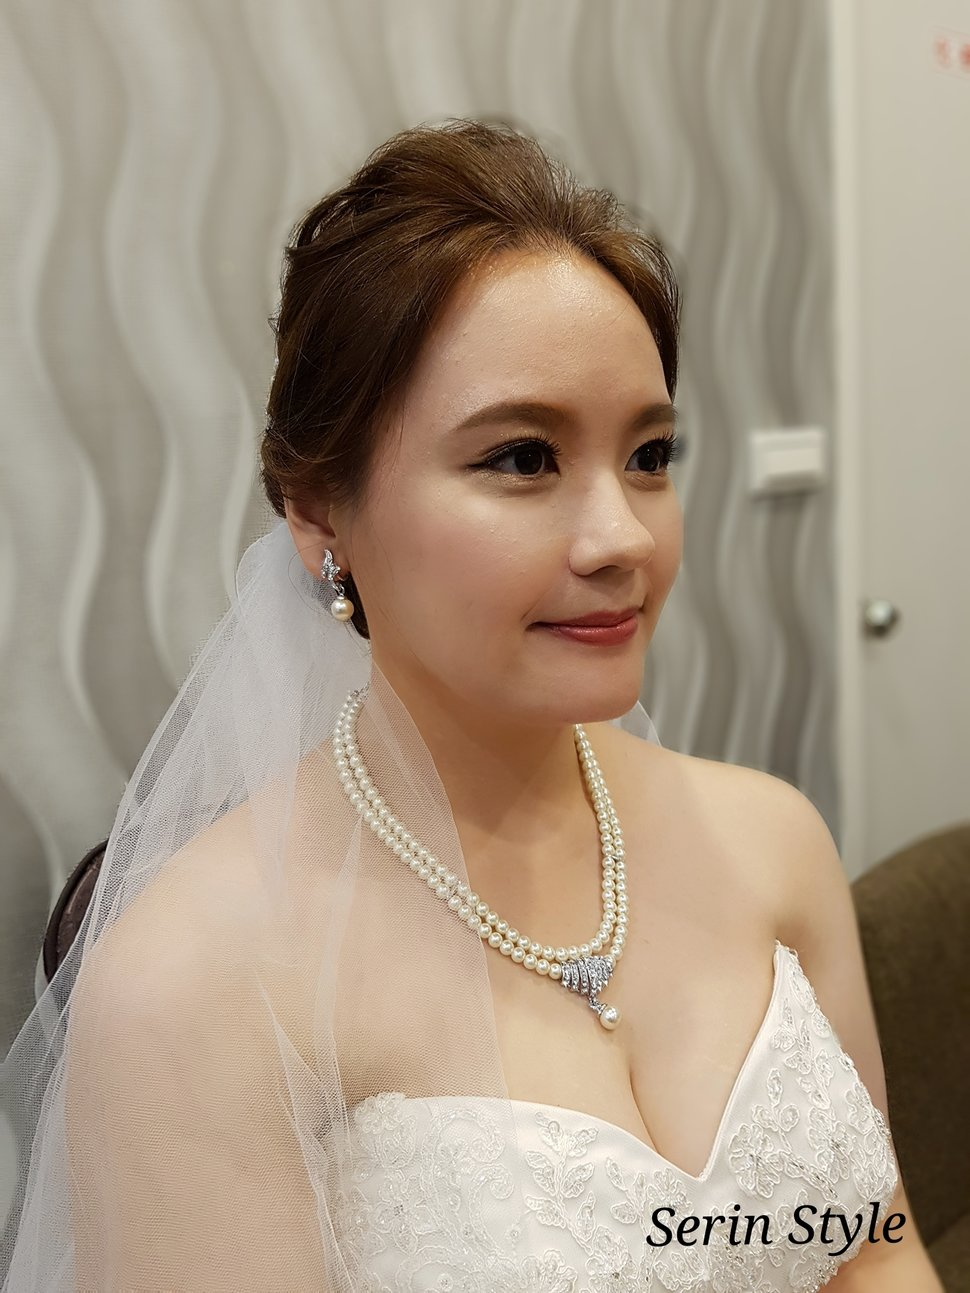 goMeihuaTemp_mh1510462847847 - Serin Style曦曦 - 結婚吧